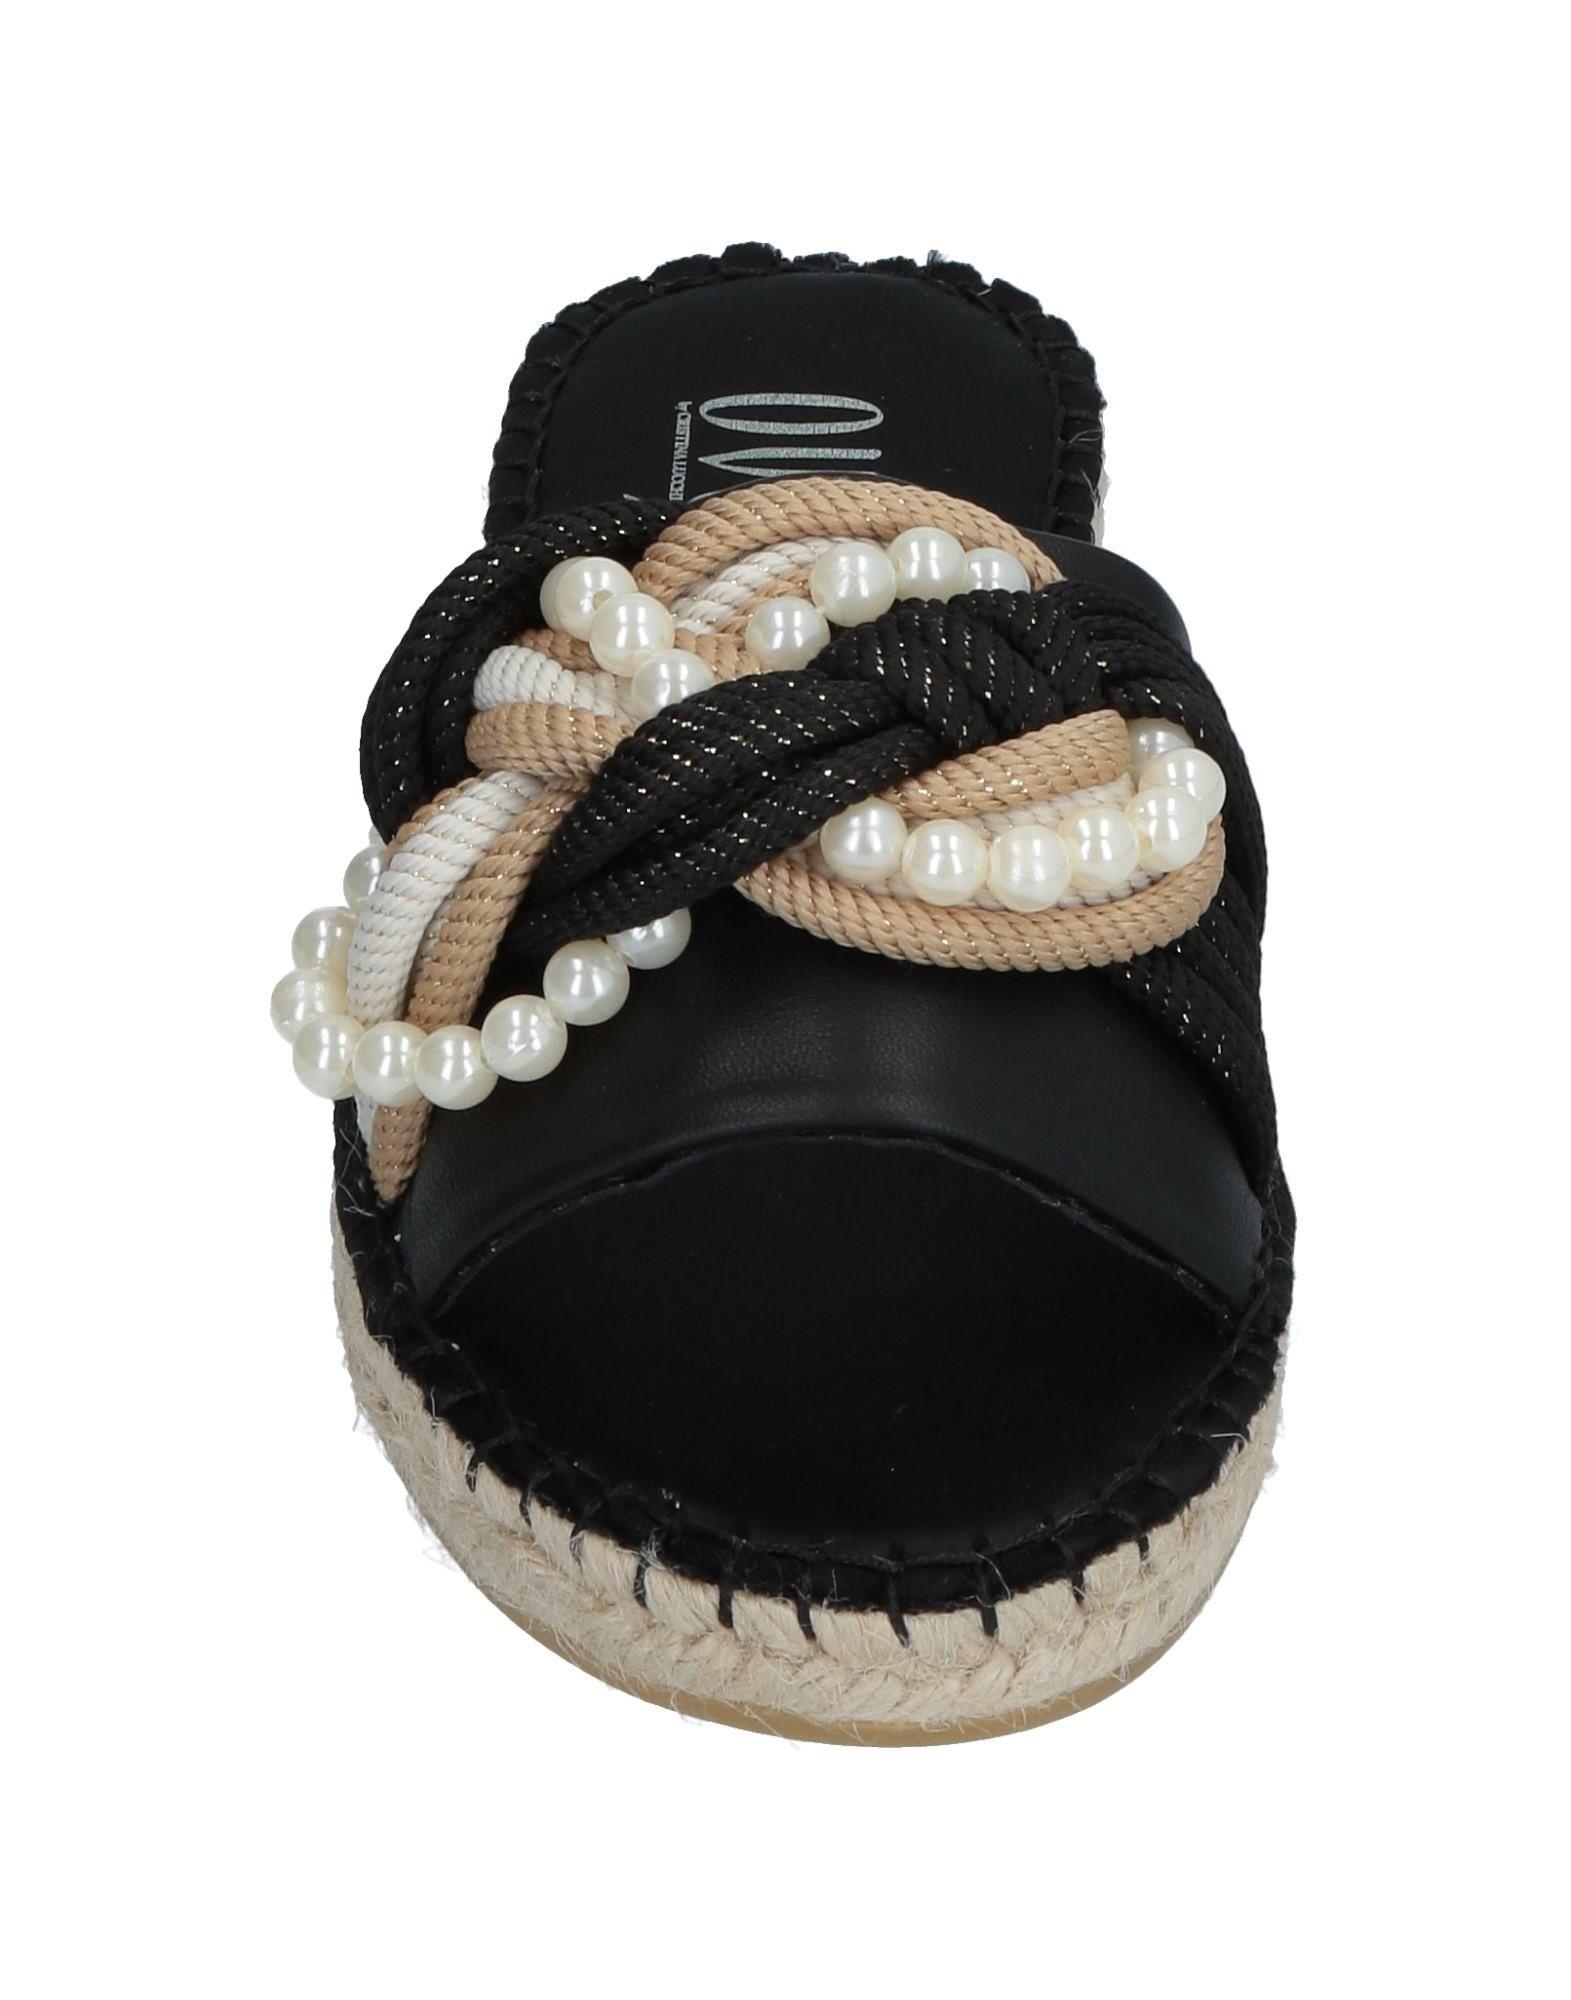 ovye & # # # 39; par cristina lucchi sandales - femmes ovye & # 39; par cristina lucchi 11569412sk sandales en ligne le royaume - uni - 692e48